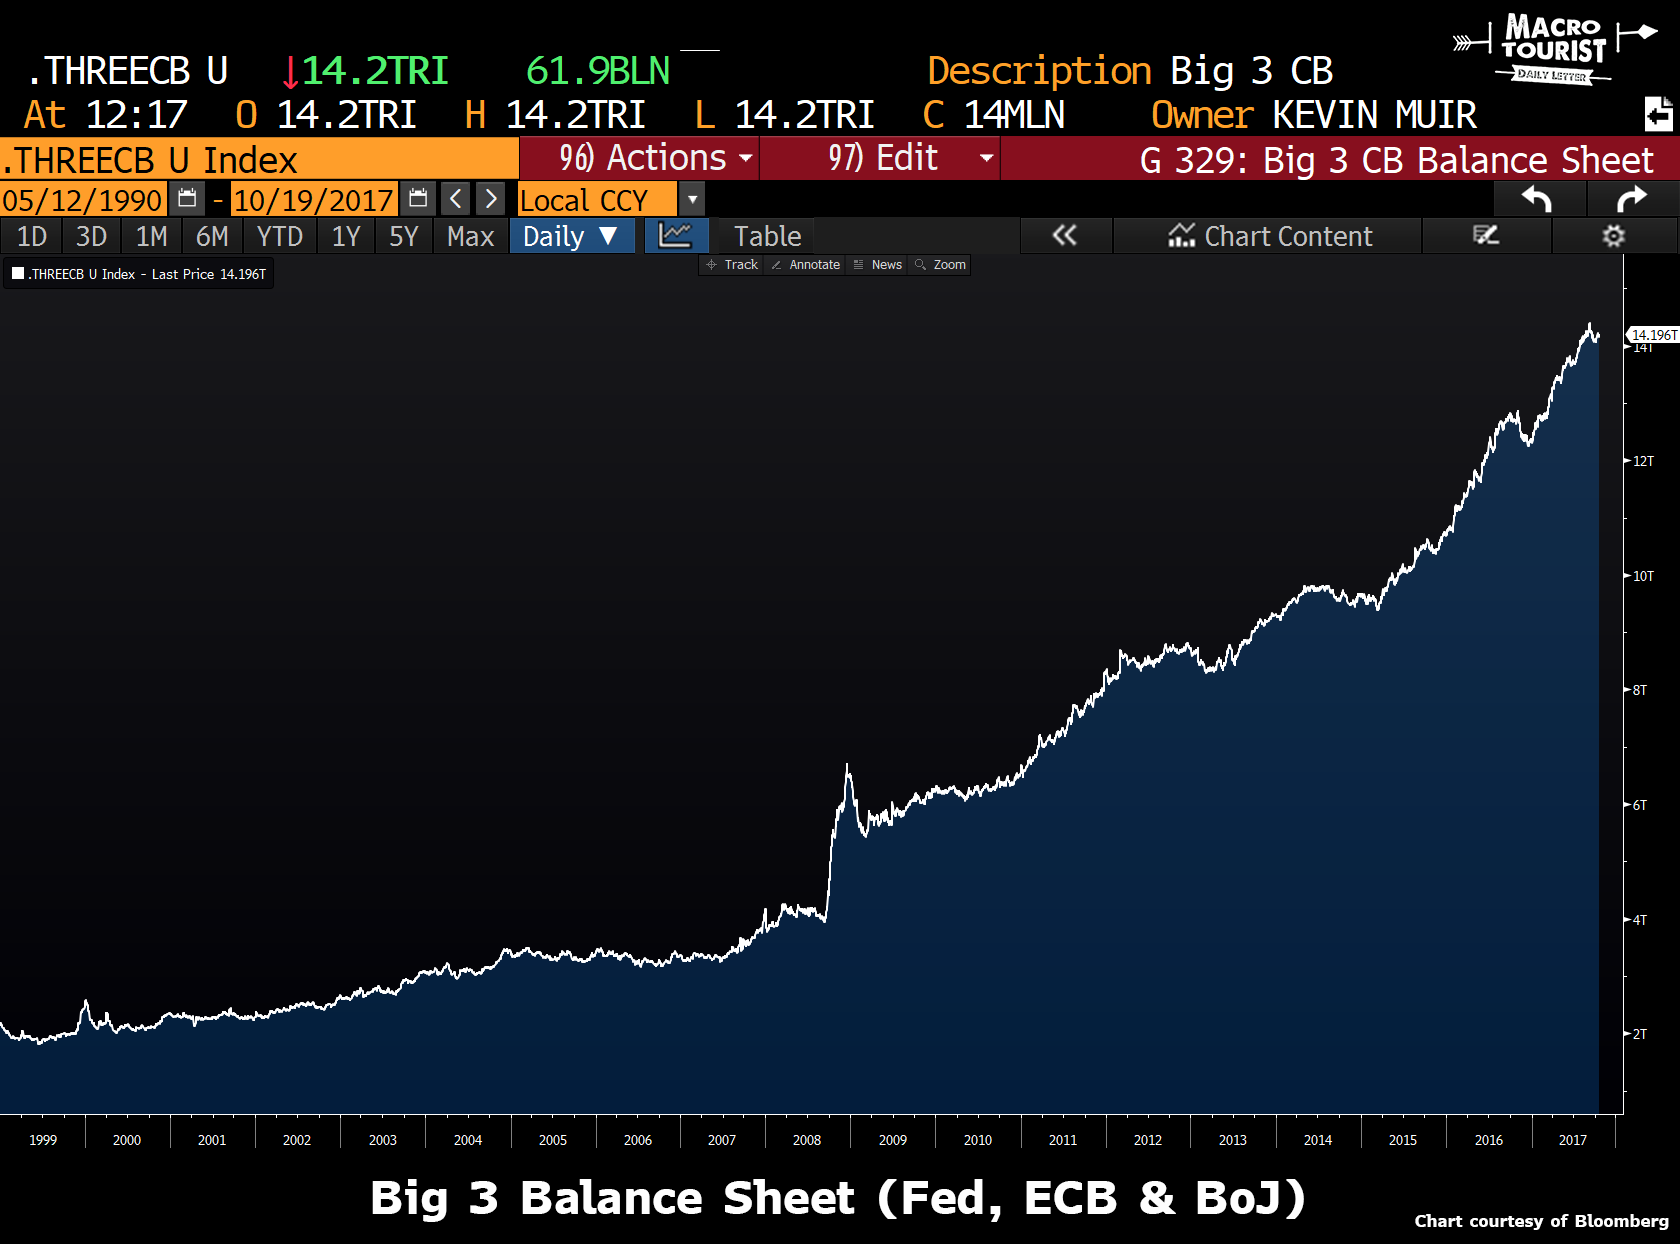 Big 3 Balance Sheet, 1999 - 2017